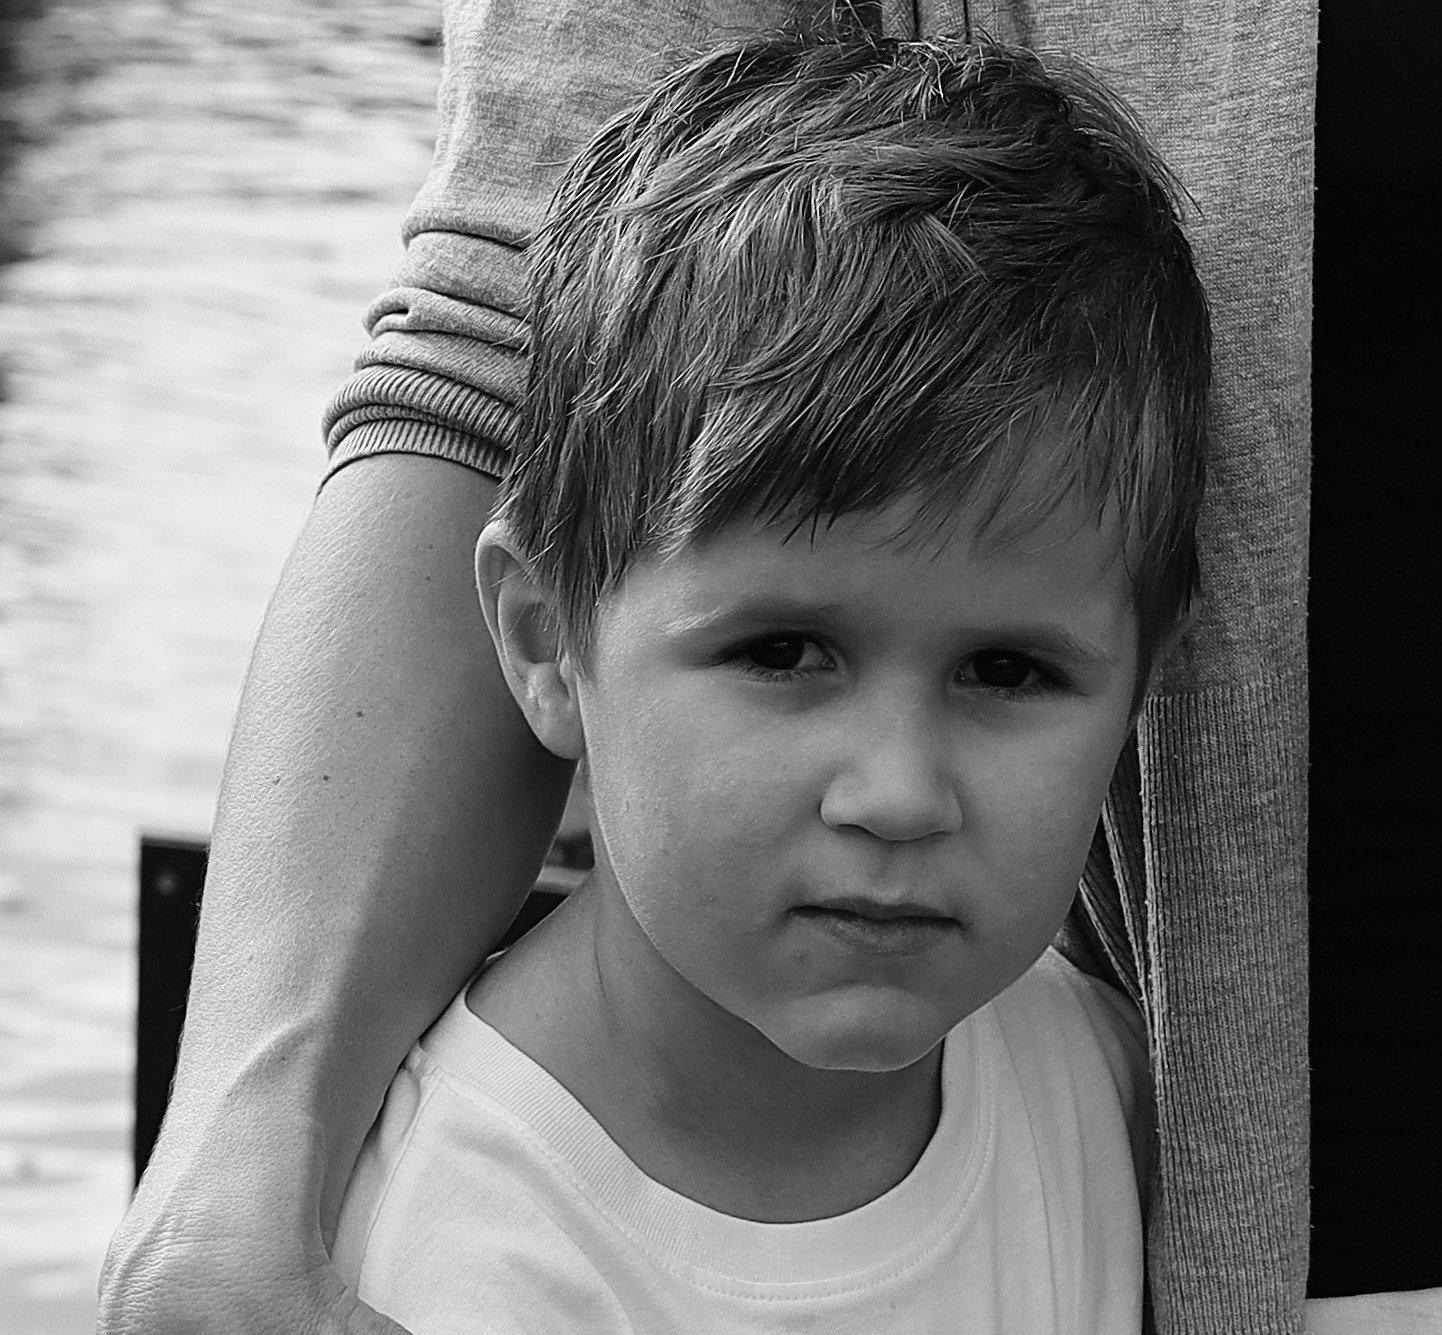 Child Mini Shoot INTRO OFFER